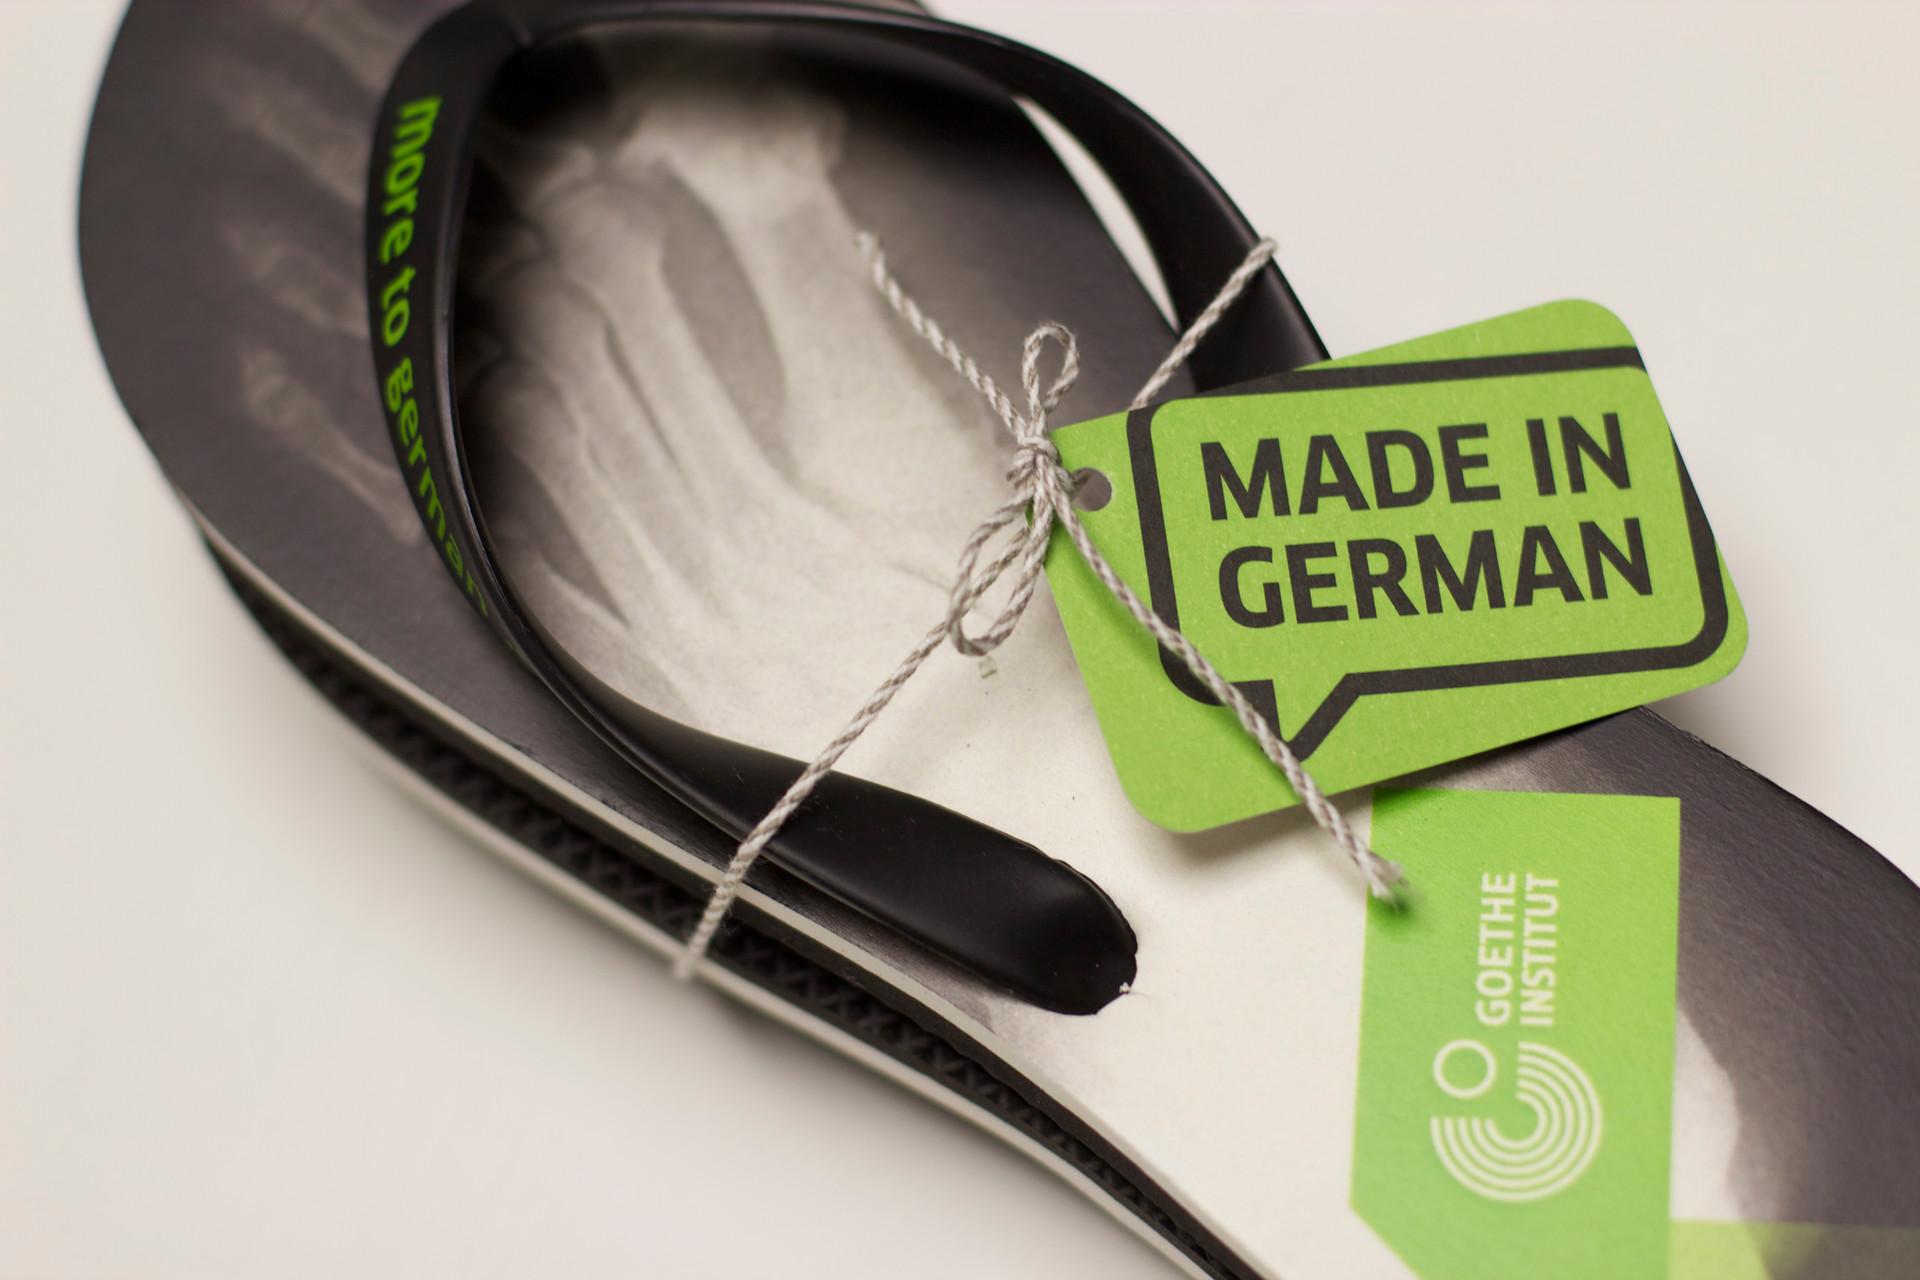 German education sandals